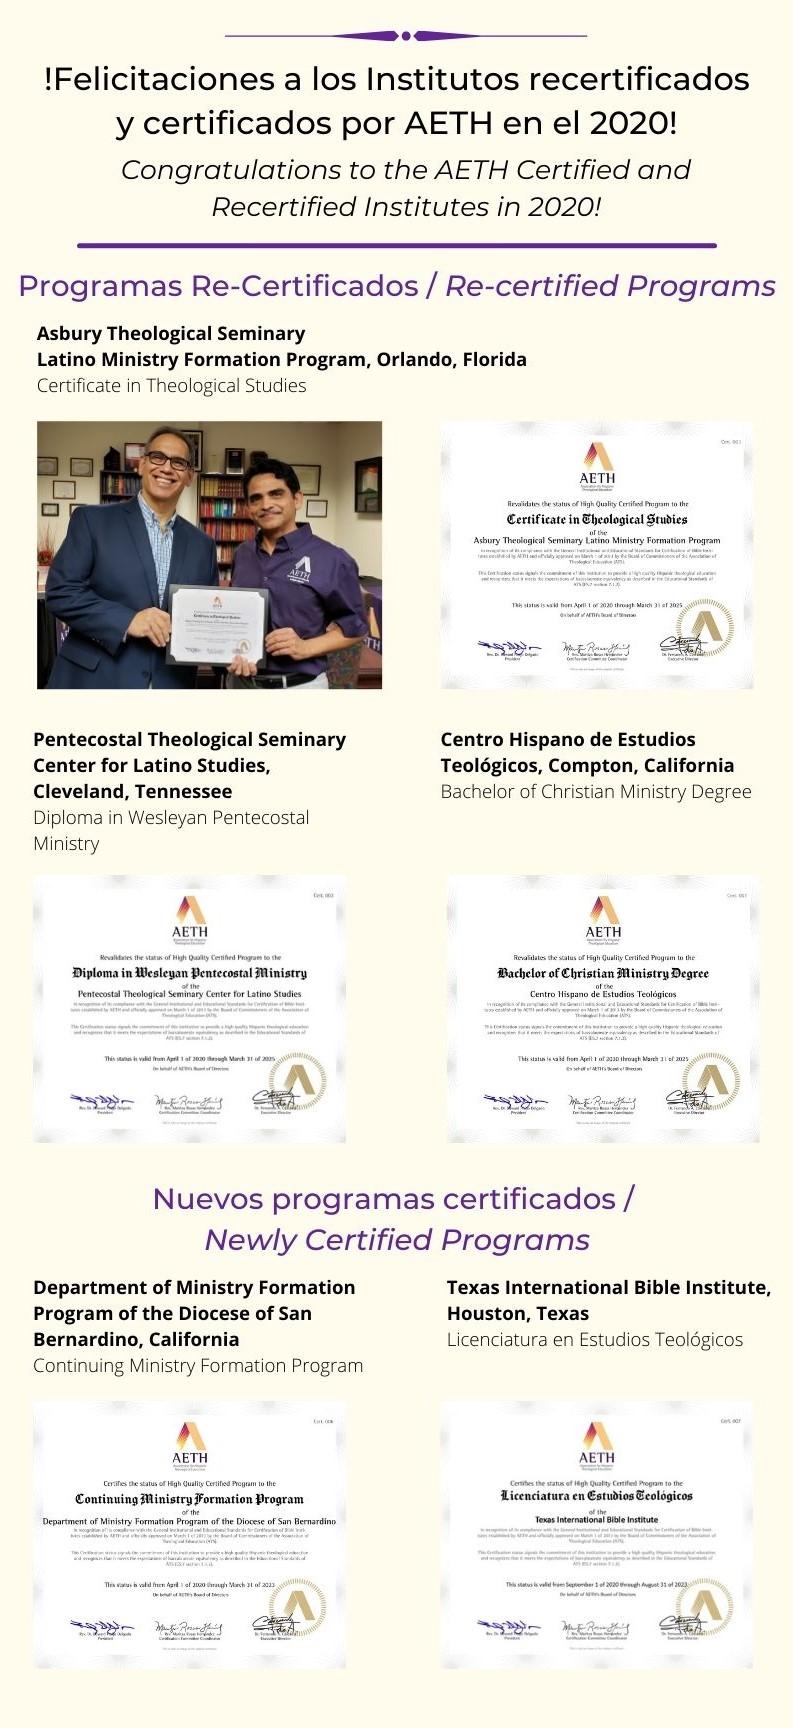 AETH Comunidad Cristiana Teológica Hispana Latina